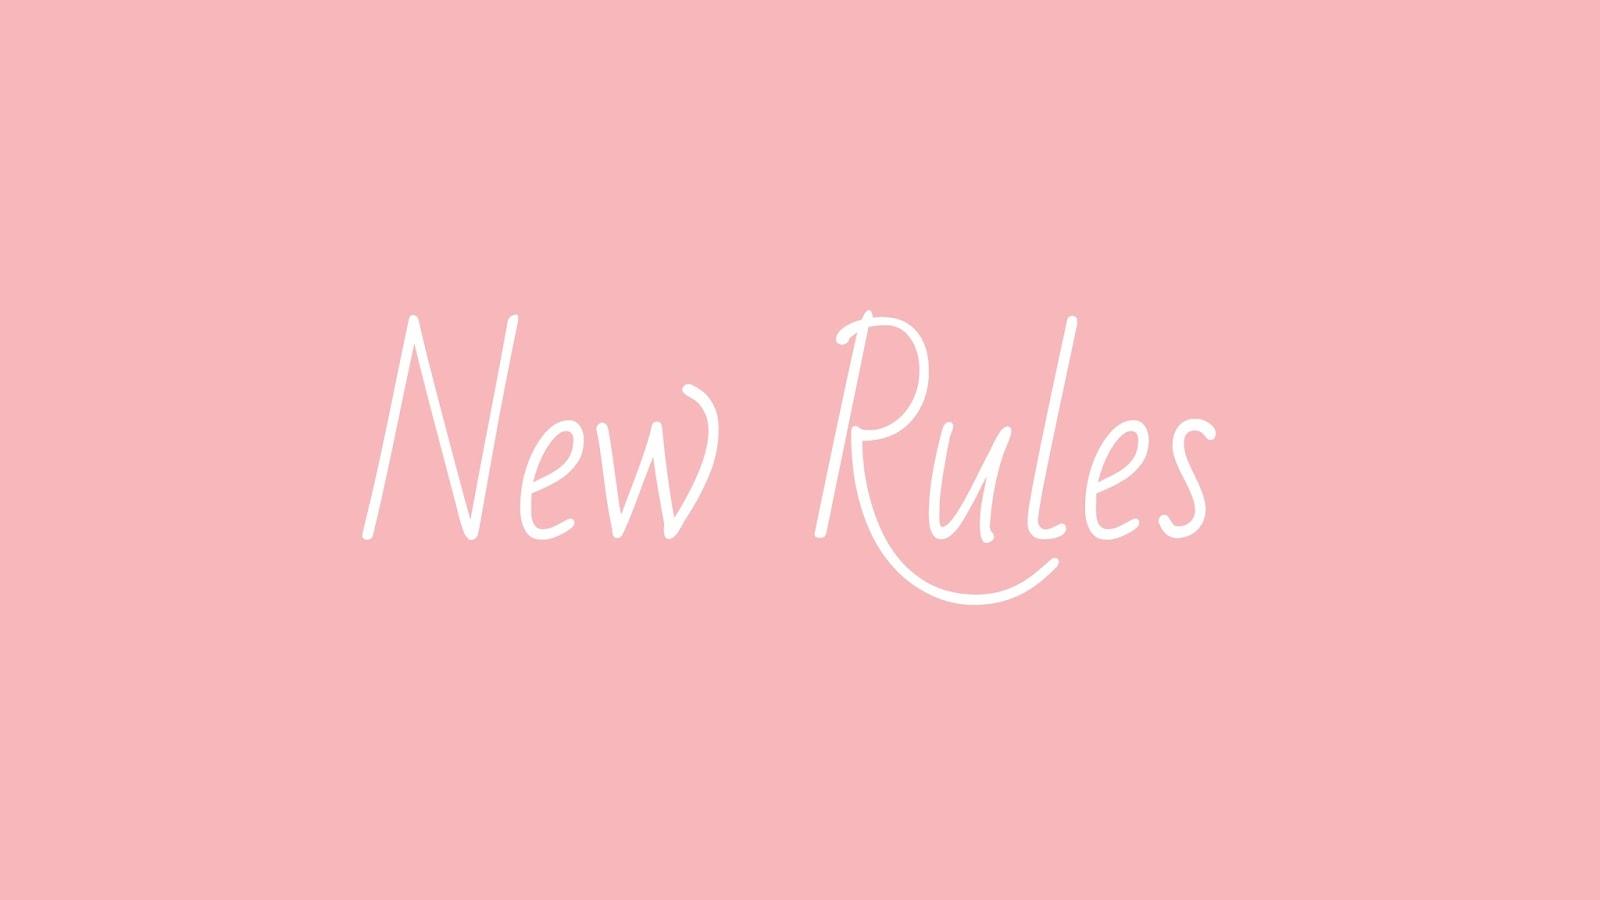 New Rules, New Rules tumblr, Dua Lipa, novas regras, skam serie